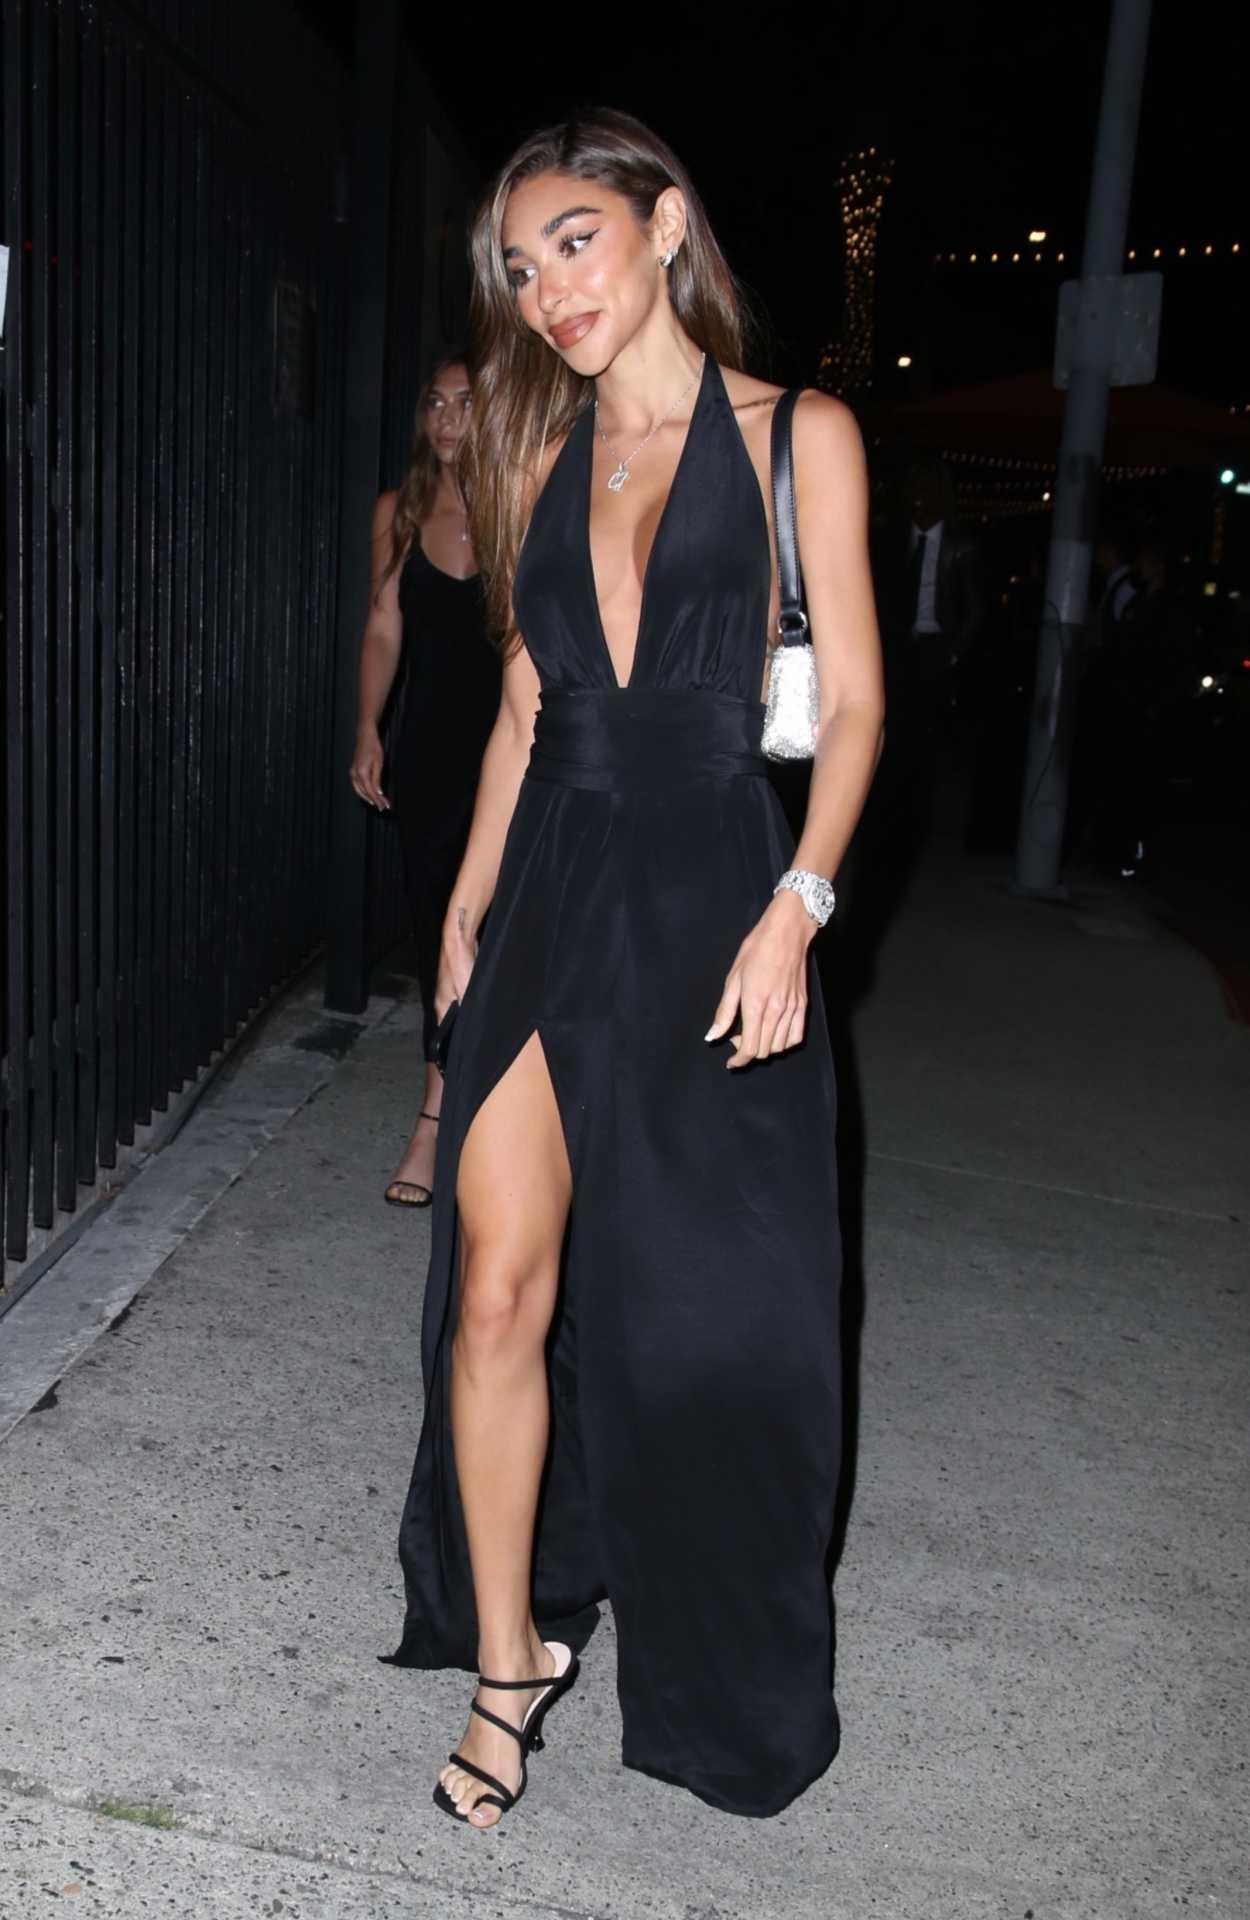 Chantel Jeffries in a Black Dress